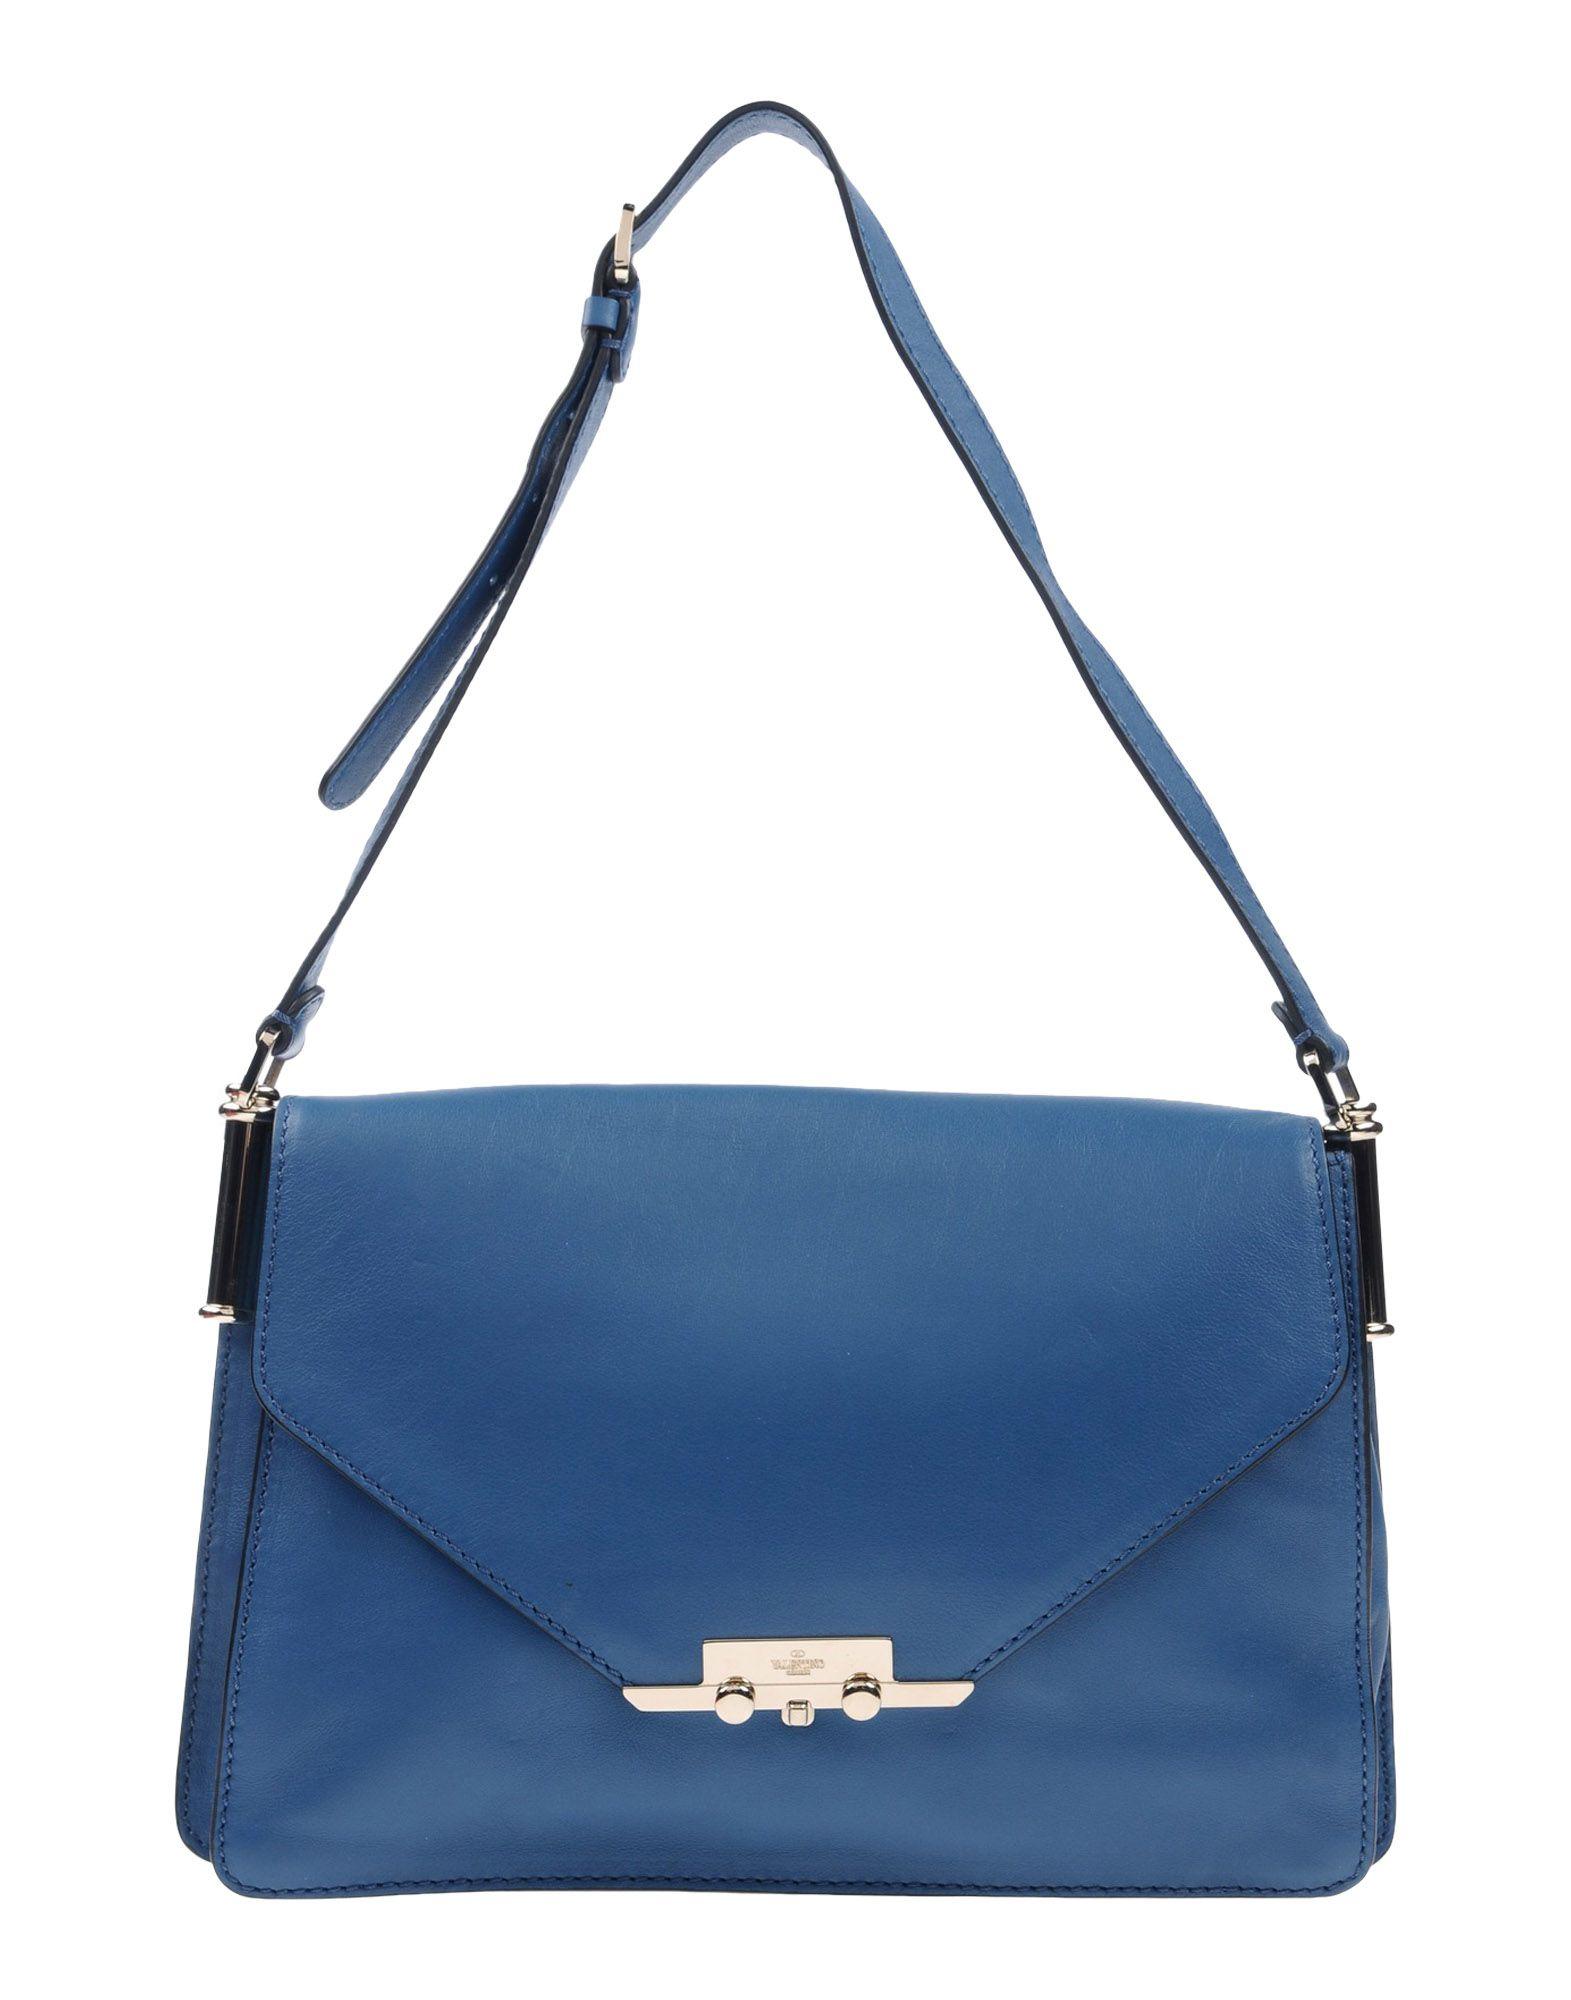 Valentino Garavani Shoulder Bag Women Bags Online On Yoox United Kingdom 45402684ko